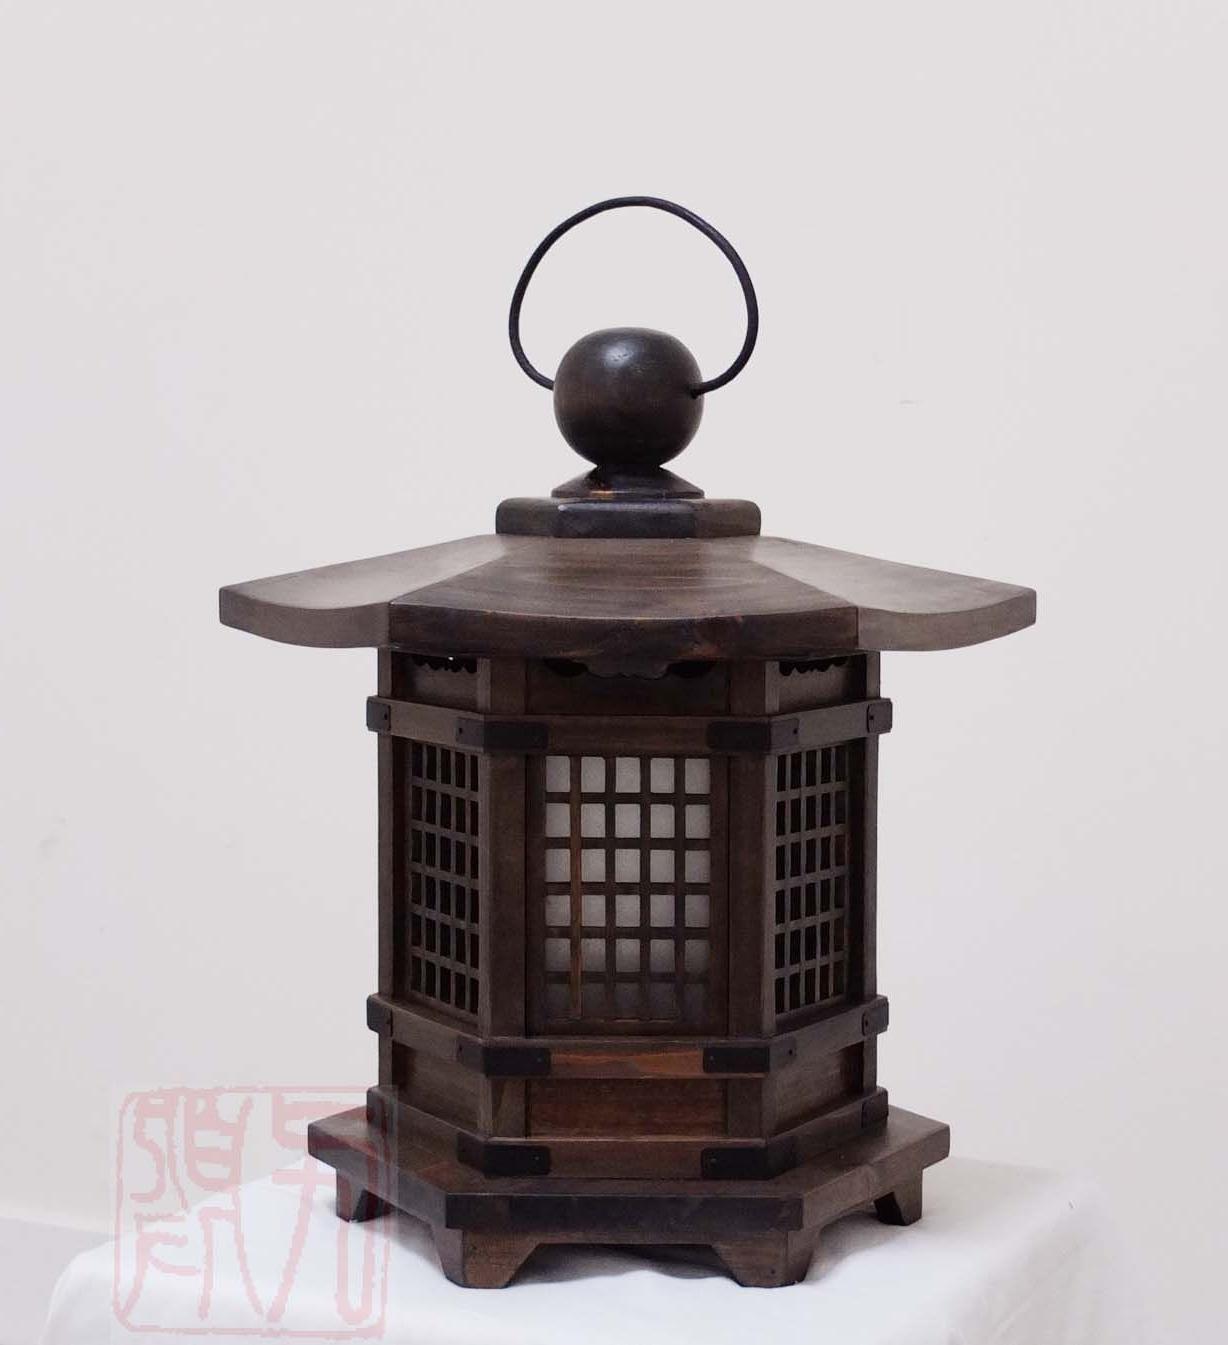 Pinte… With Regard To Outdoor Hanging Japanese Lanterns (Gallery 2 of 20)